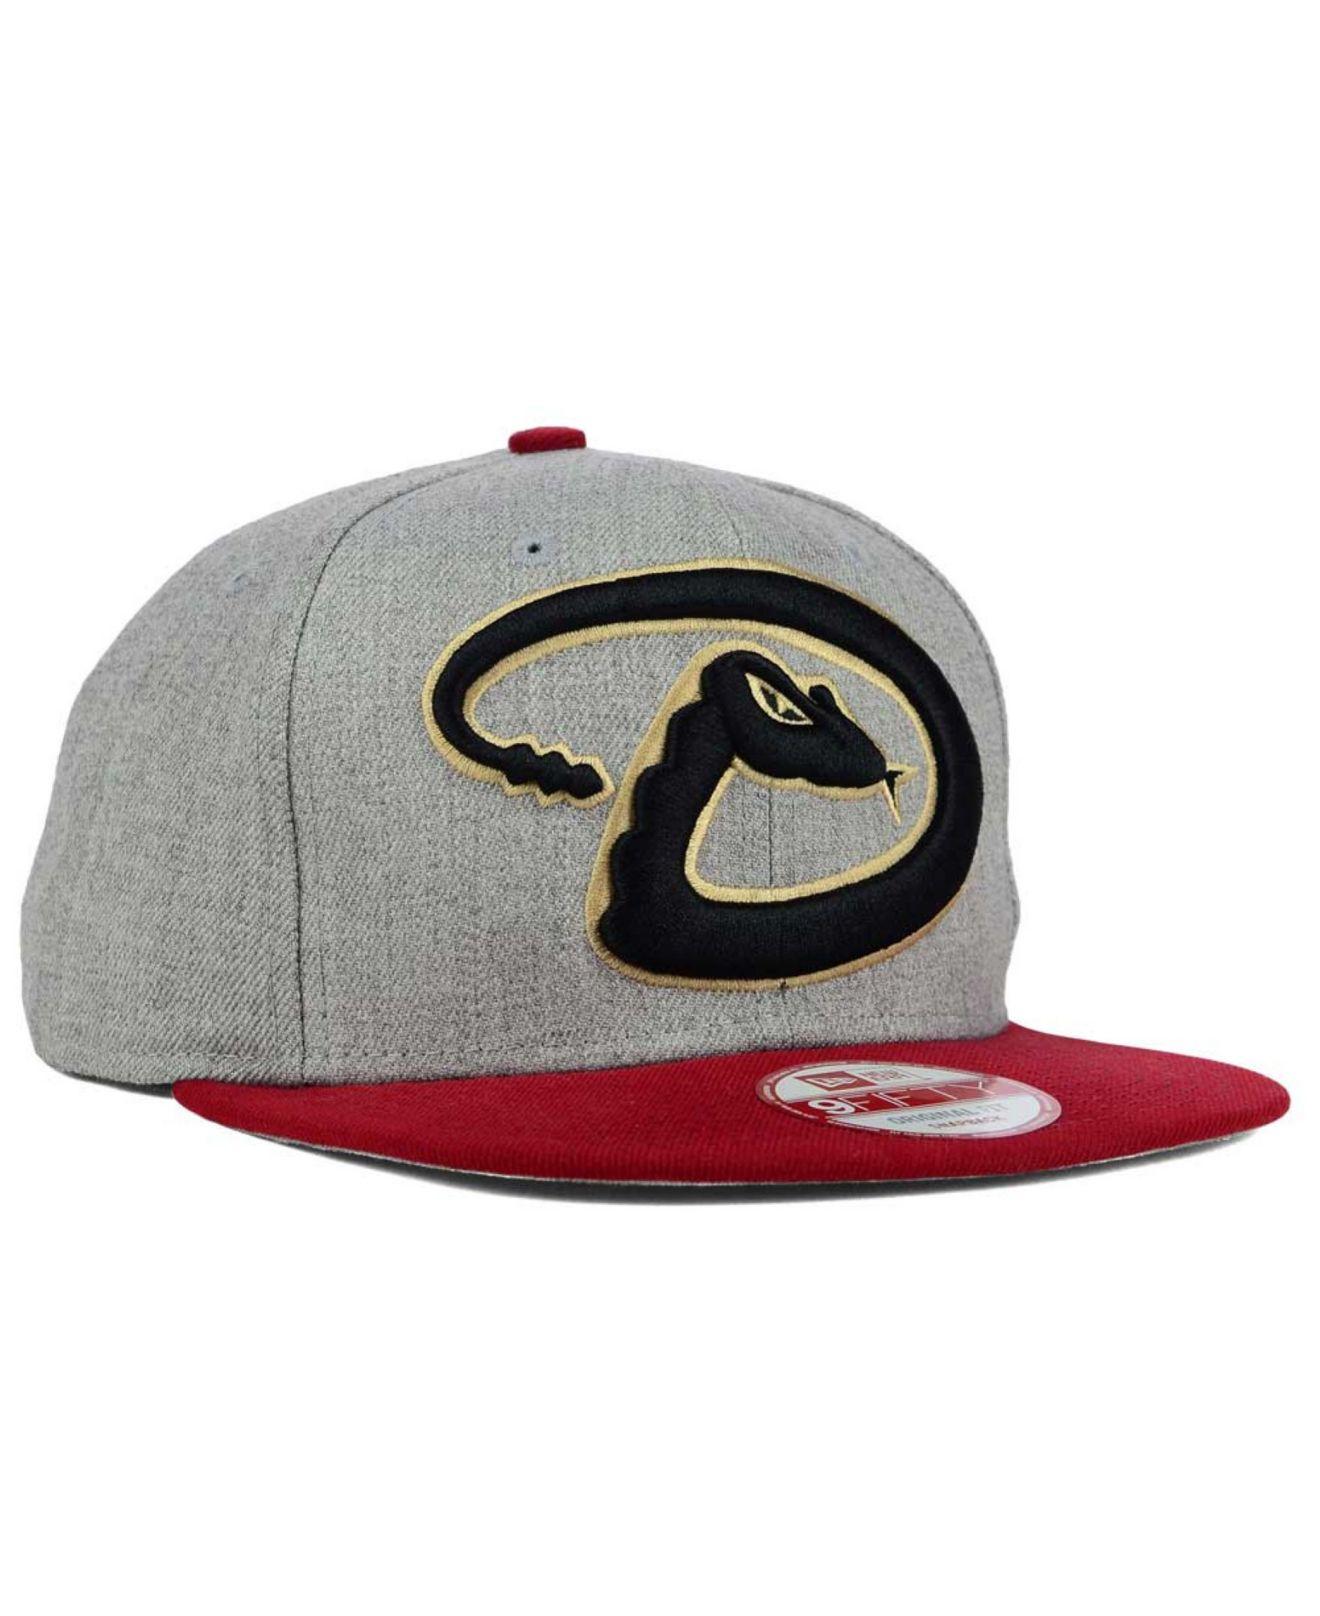 4d93c51e95d Lyst - KTZ Arizona Diamondbacks Logo Grand 9fifty Snapback Cap in ...